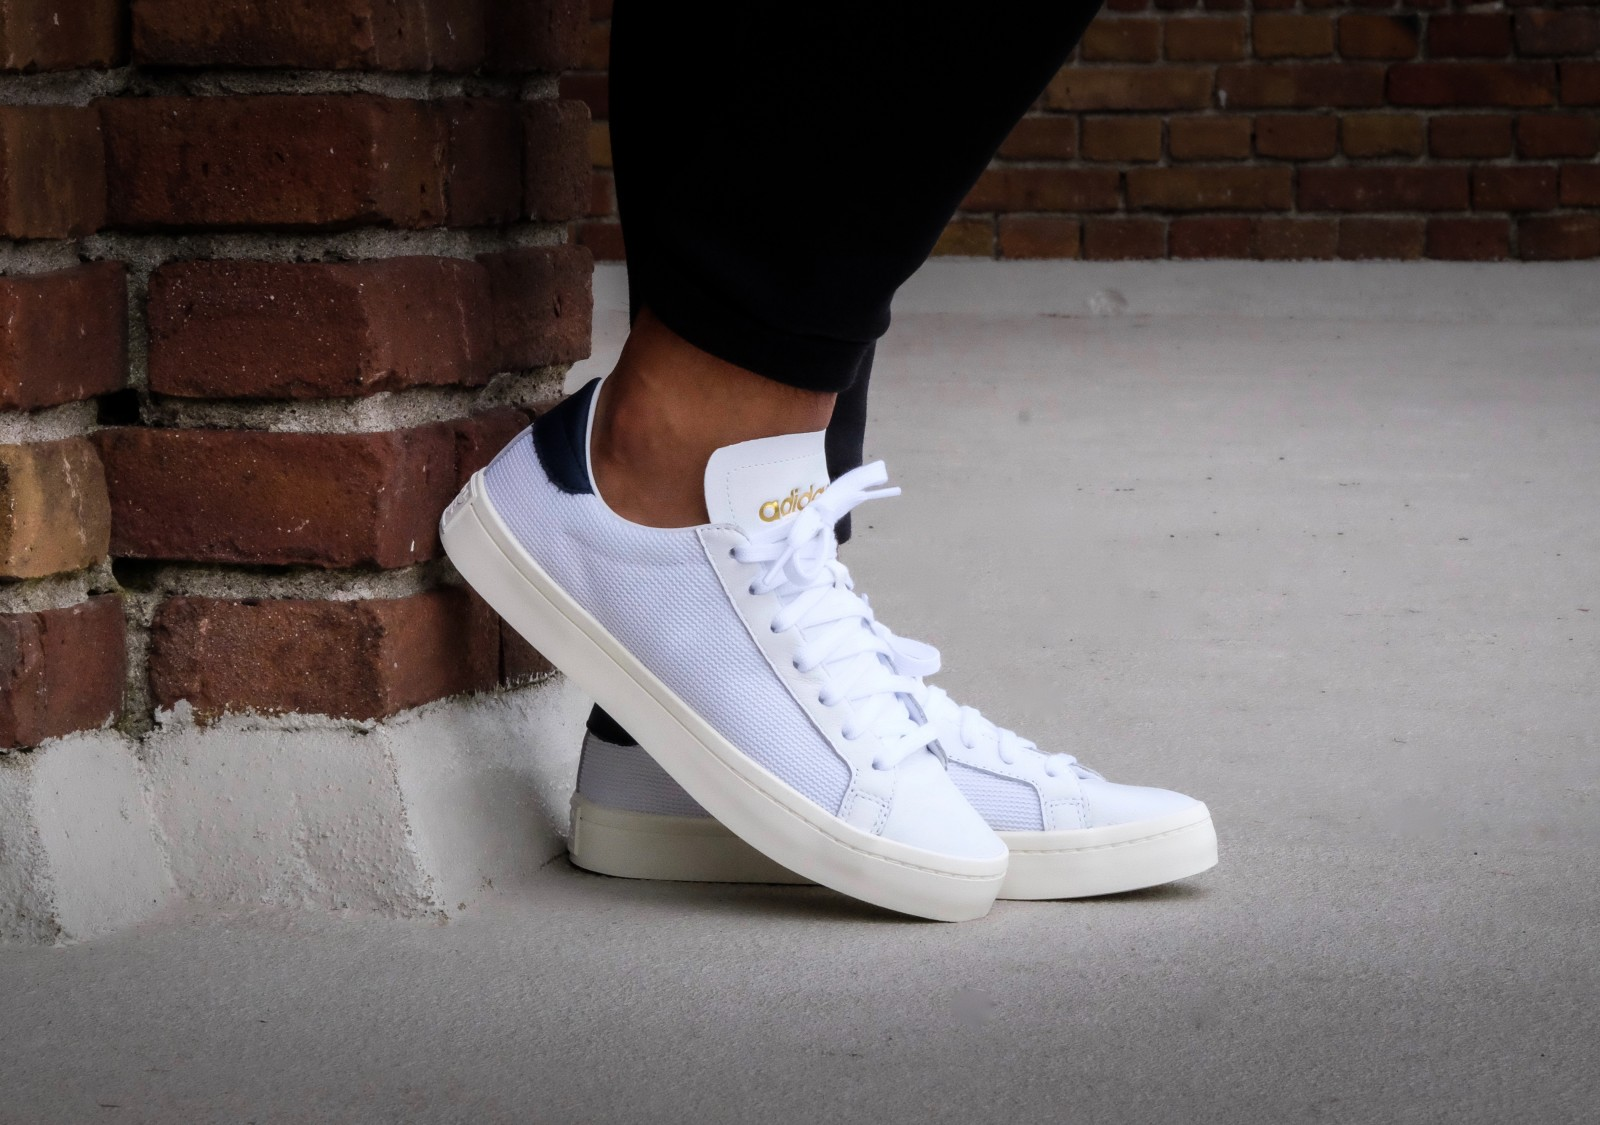 adidas court vantage footwear white collegiate navy bz0427. Black Bedroom Furniture Sets. Home Design Ideas